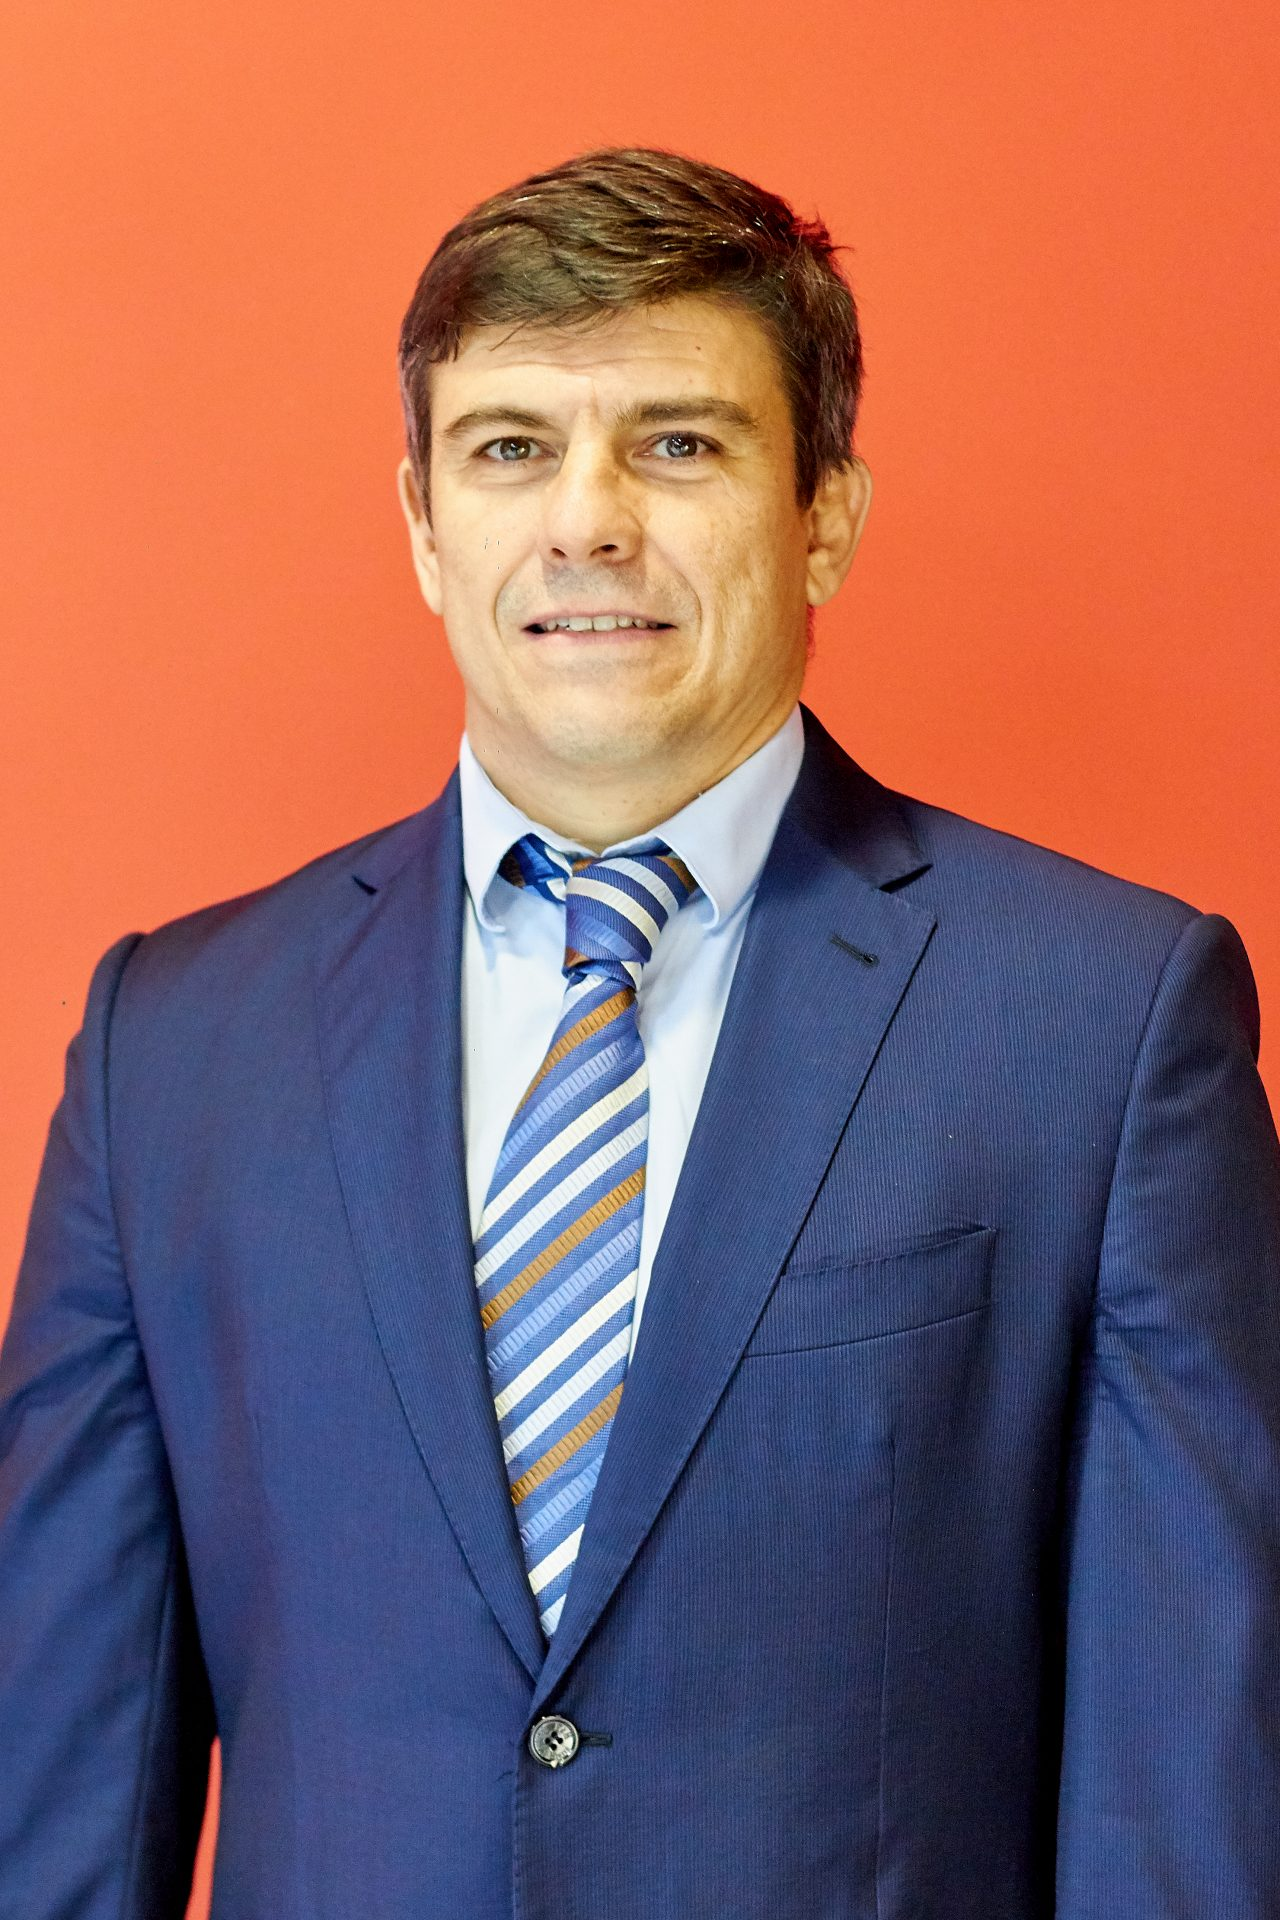 Francisco Javier Herrero Poyato